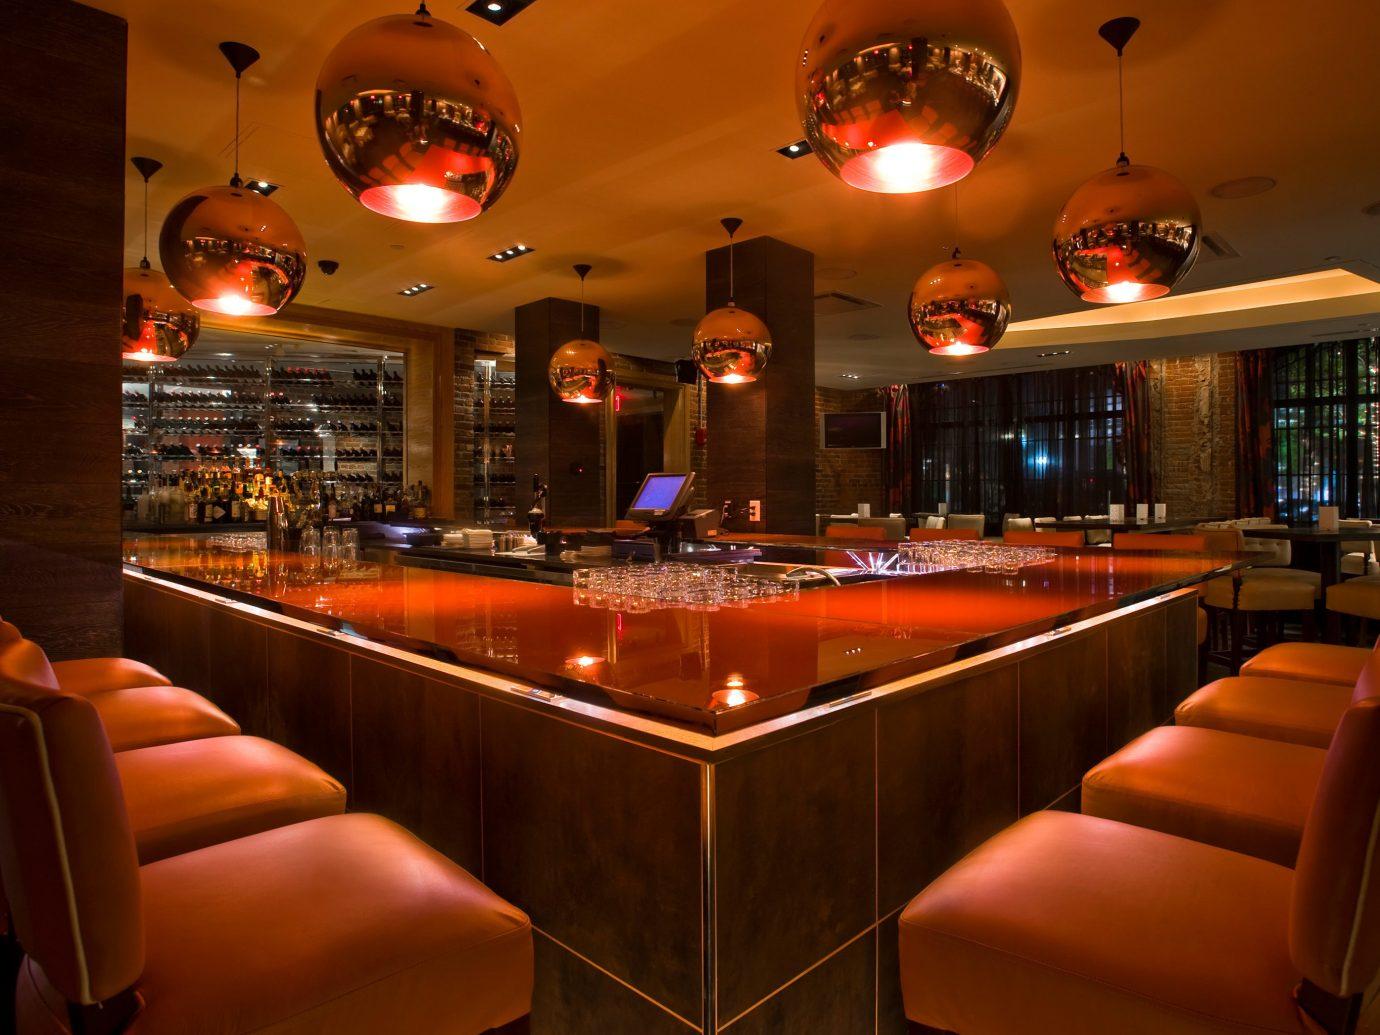 Bar Dining Drink Eat Food + Drink Historic Luxury Modern indoor room restaurant function hall meal interior design furniture